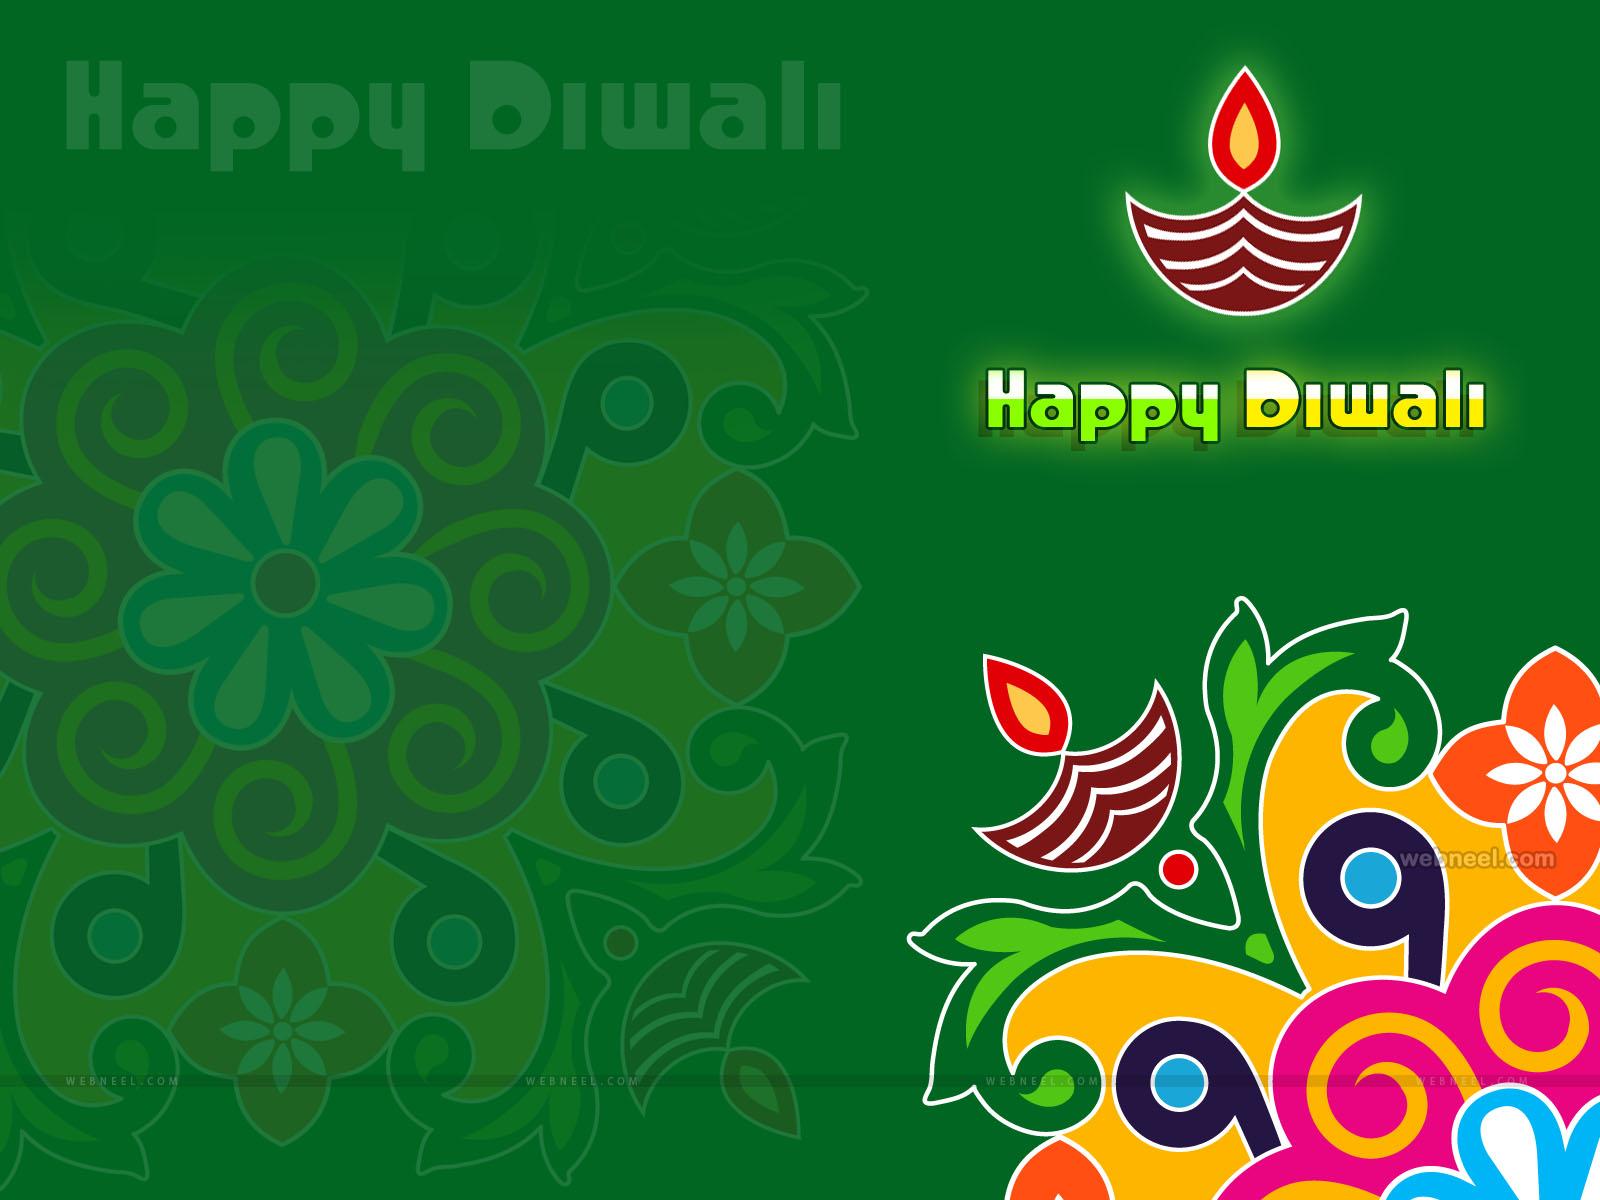 rangoli diya diwali wallpaper design by webneel